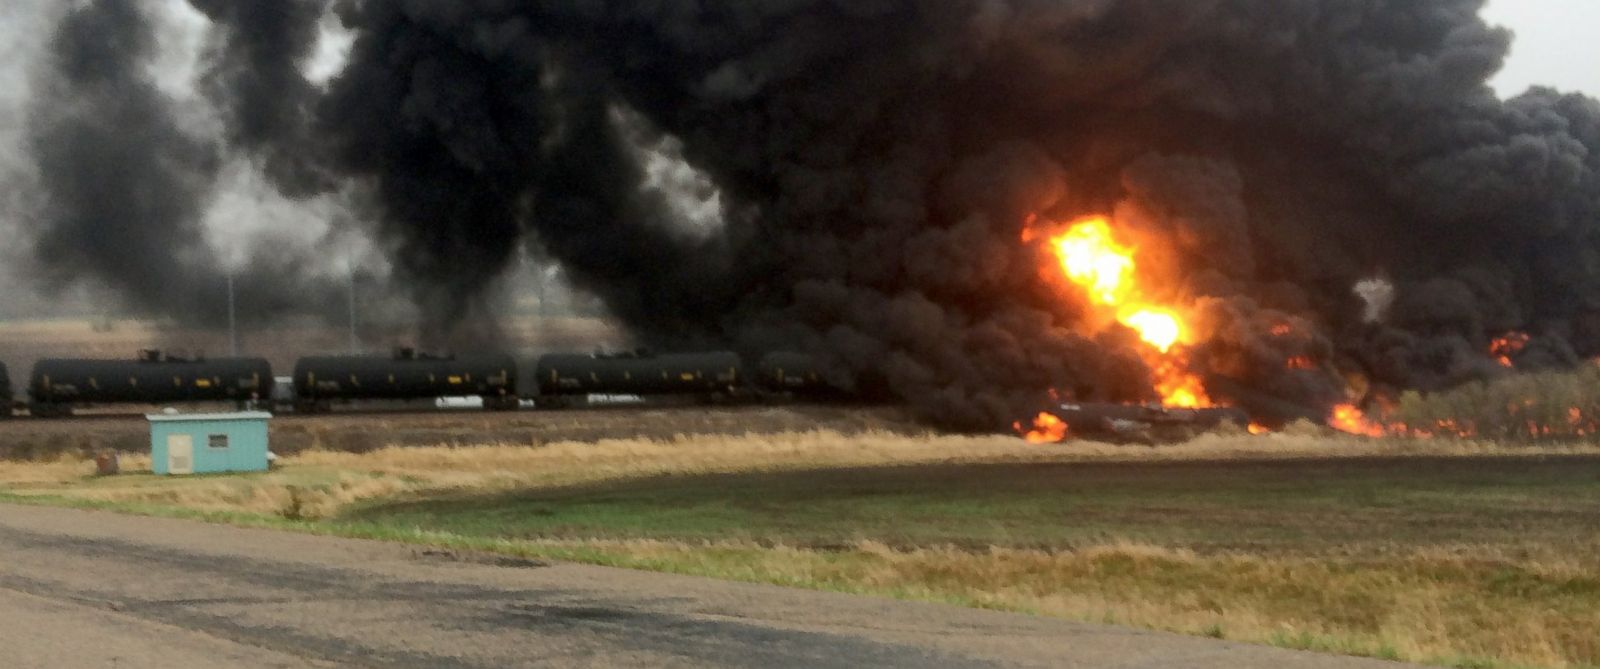 PHOTO: A 109-car Burlington Northern Santa Fe oil tanker train derailed and caught fire near a small town in North Dakota, May 6, 2015.